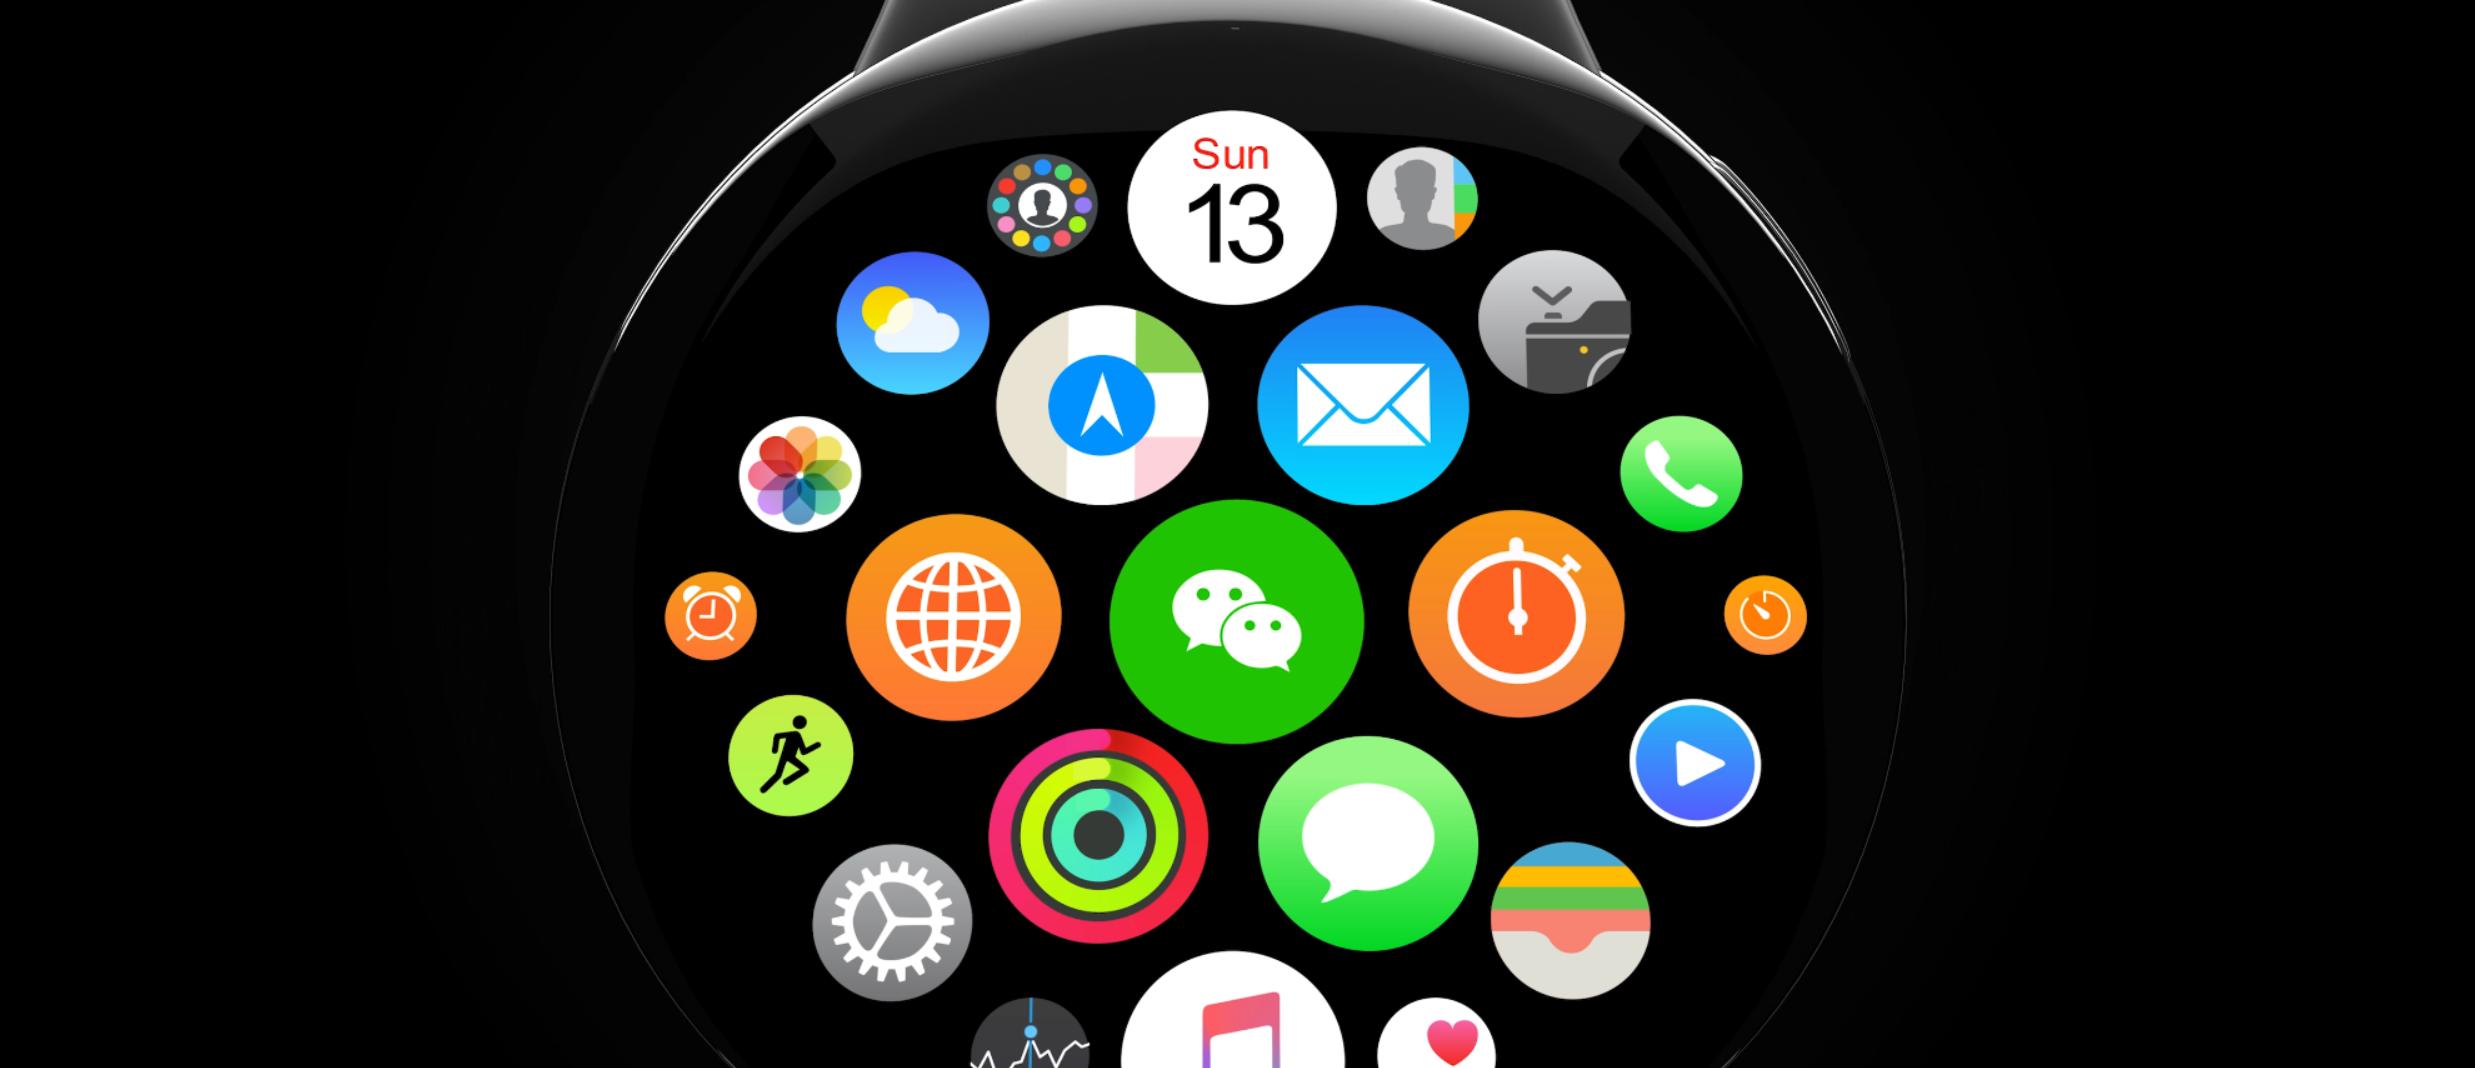 Apple Watch X concept 2017